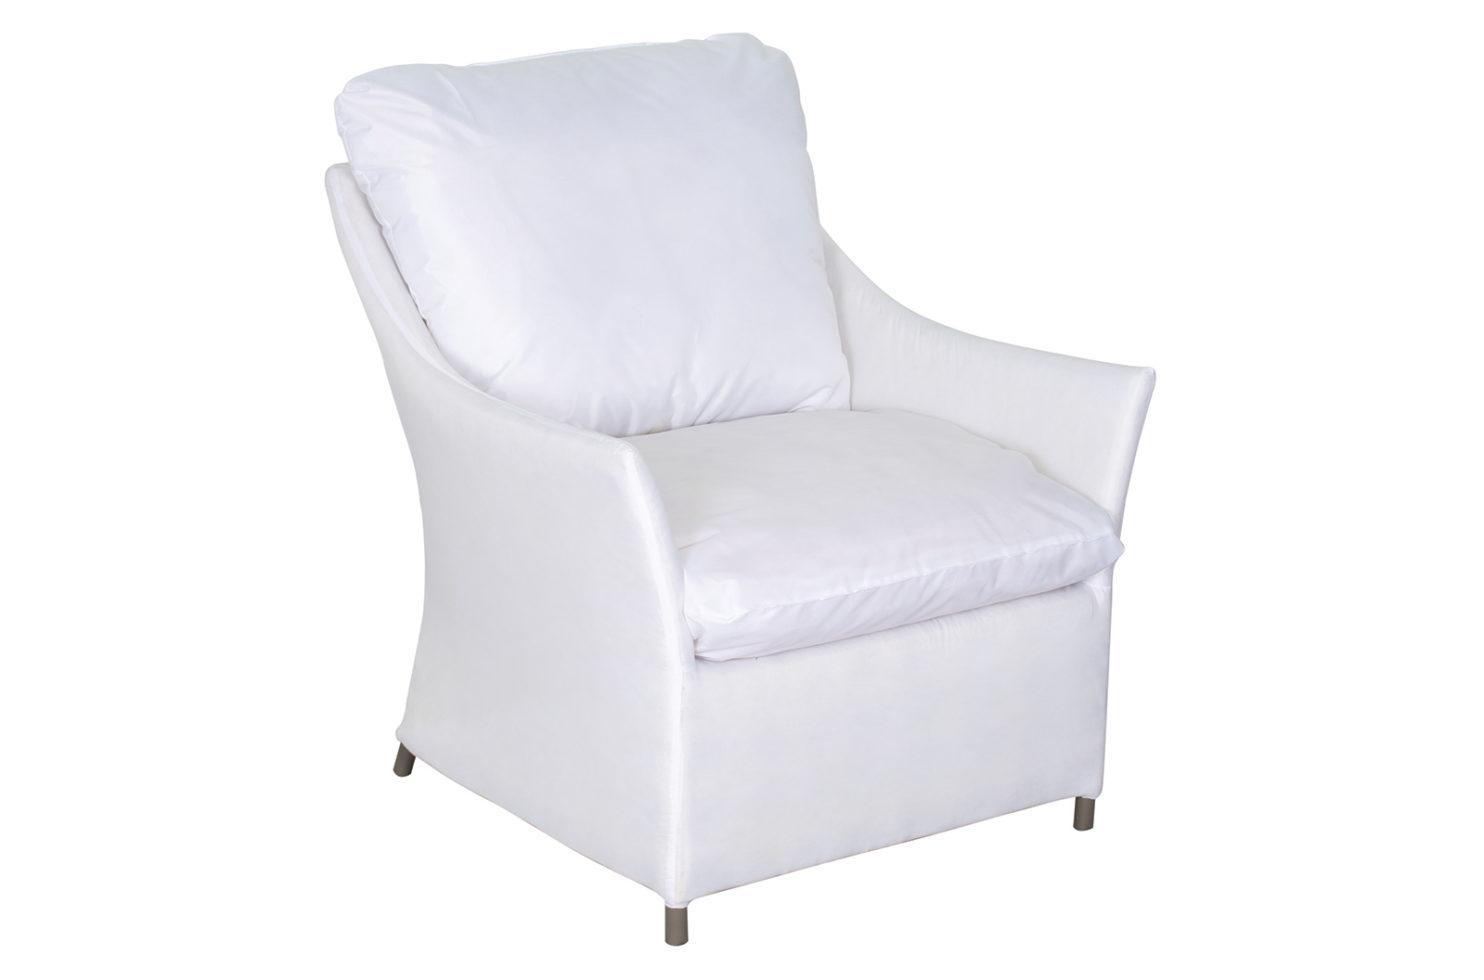 capri lounge frame 620FT091P2 1 3Q